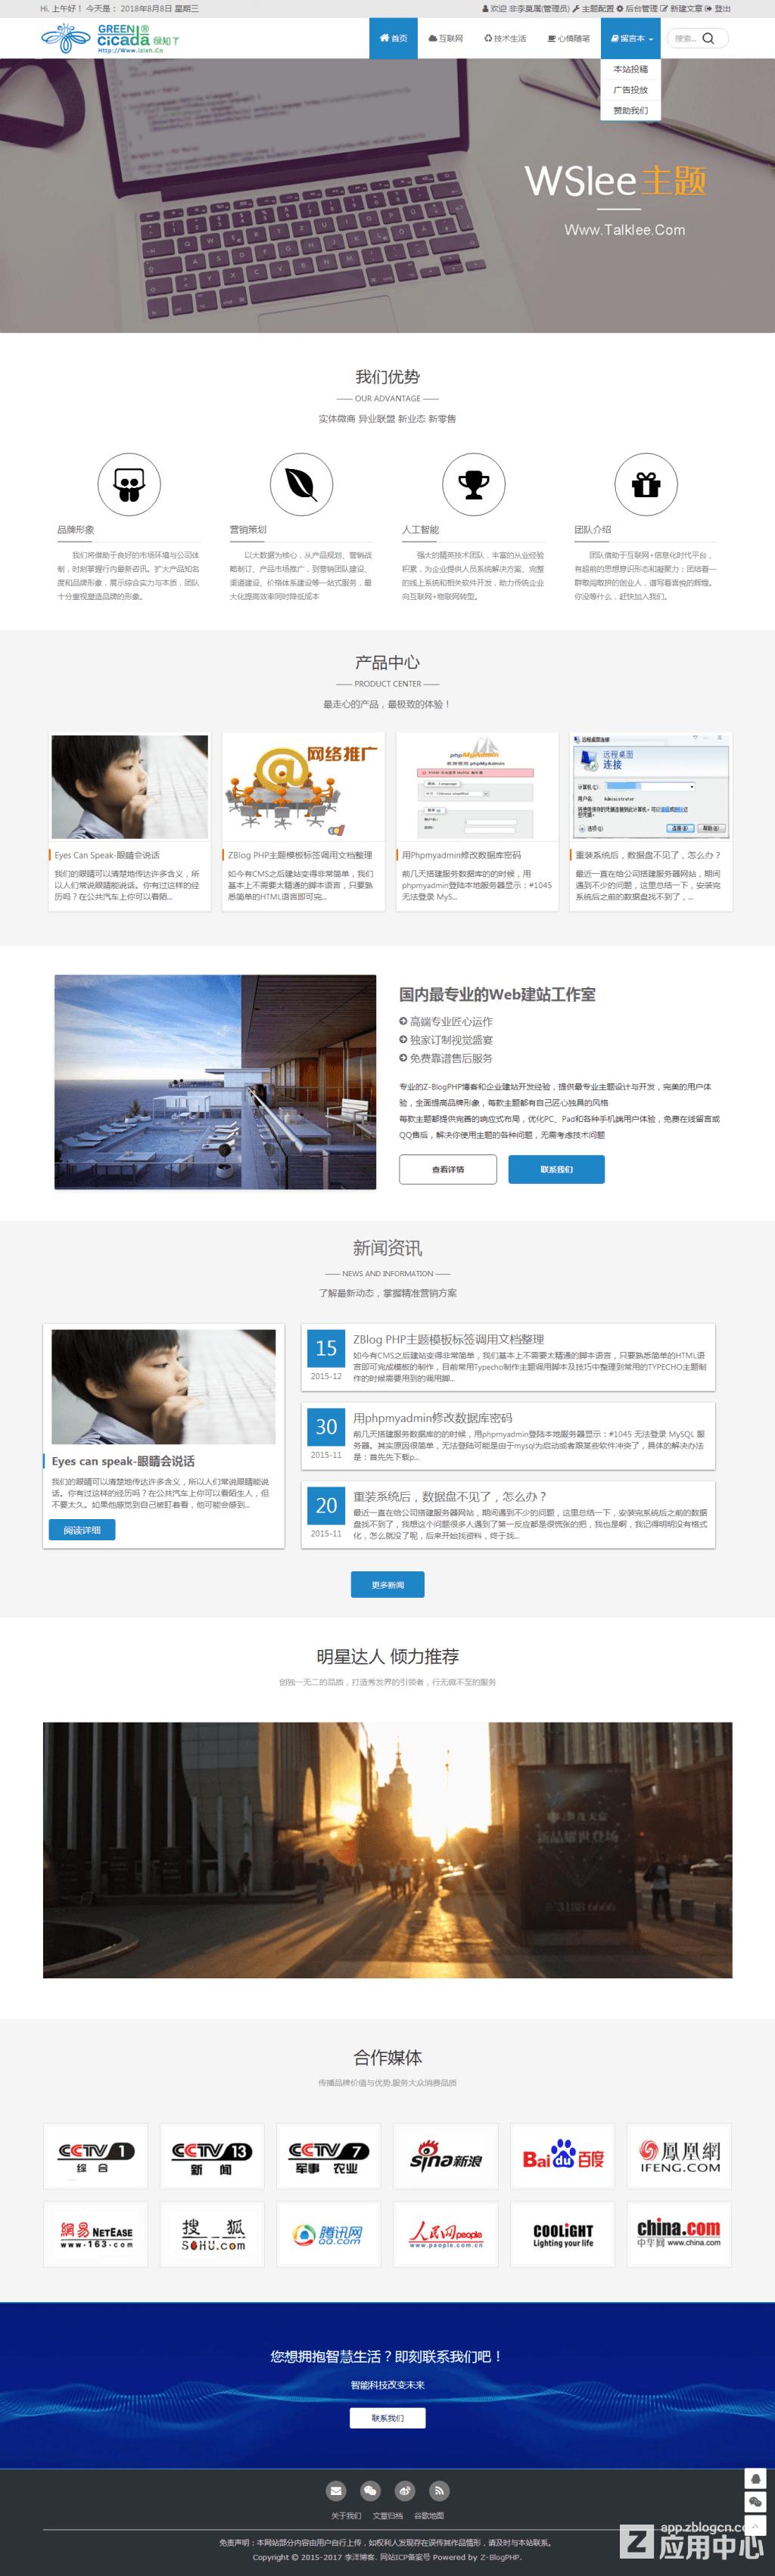 Z-Blog首款微商企业类型主题模板--微商互联(Wslee),Z-Blog首款微商企业类型主题模板--微商互联(Wslee) 第7张,第7张